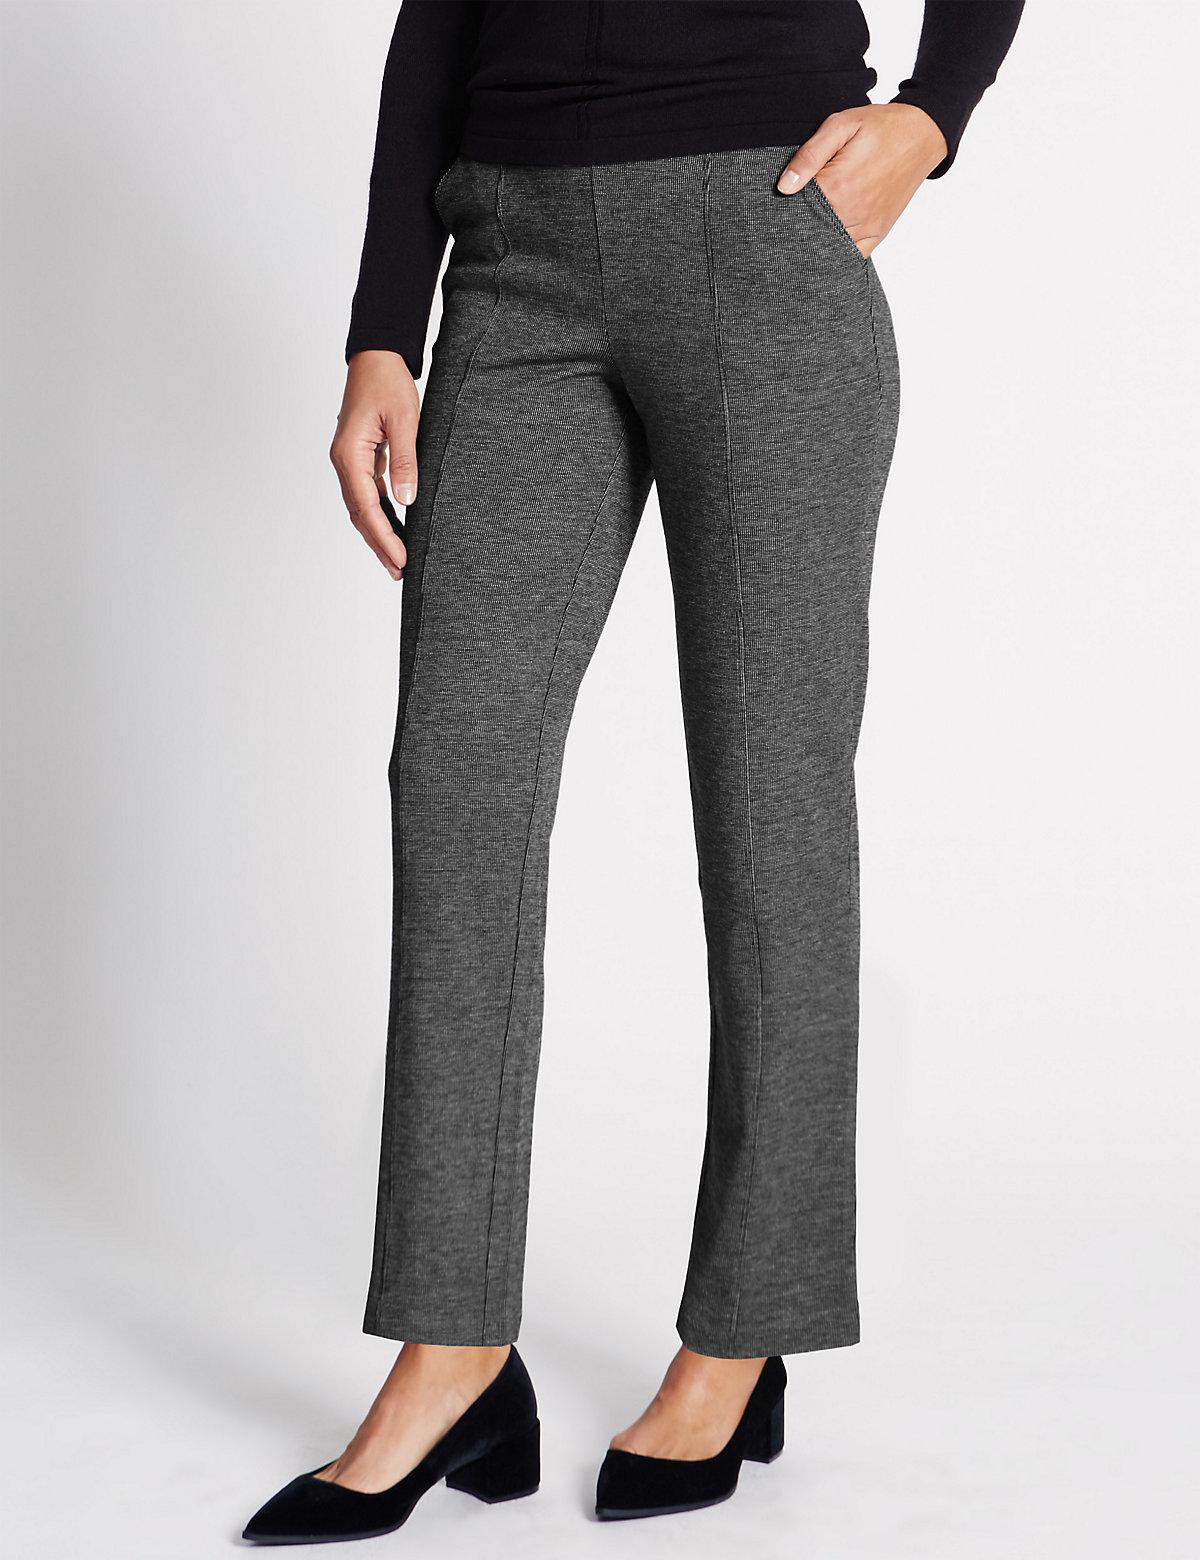 Classic Design Ponte Straight Leg Trousers